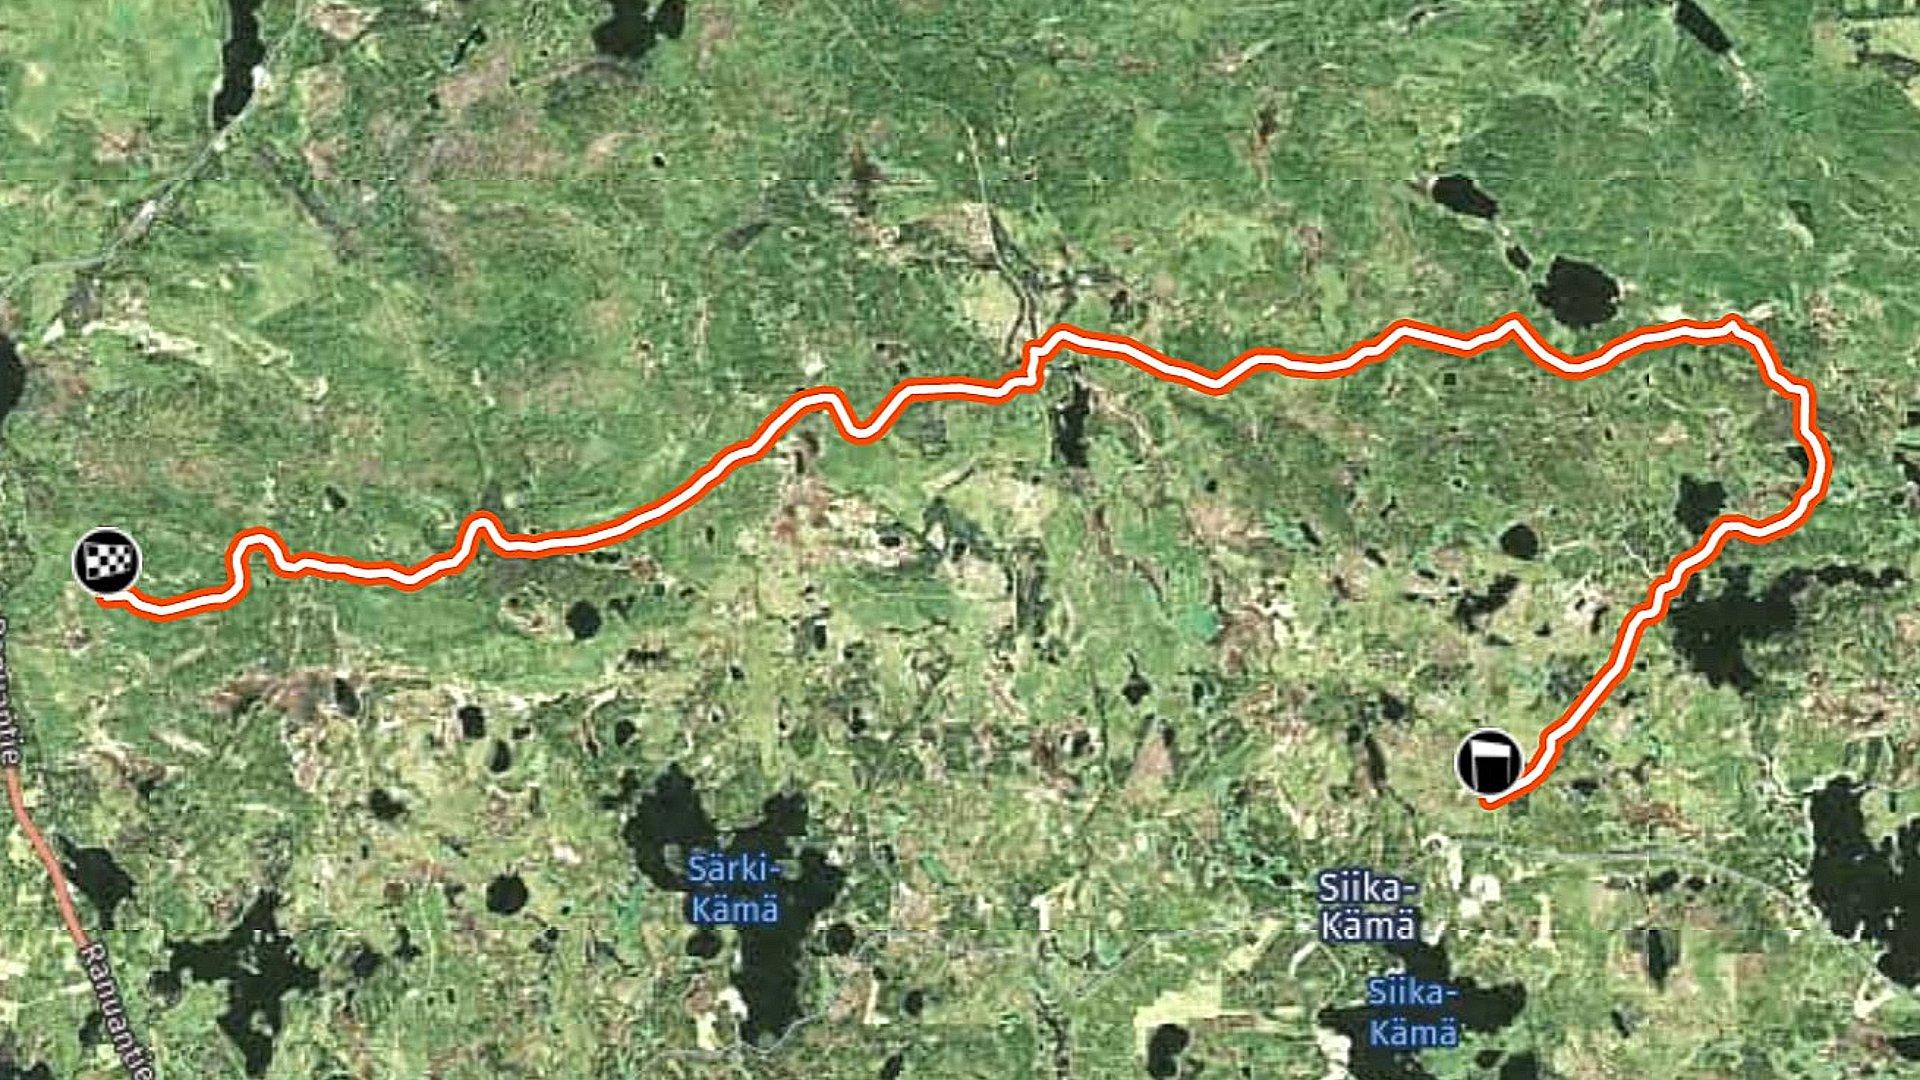 WRC: Arctic Rally Finland - Powered by CapitalBox [26-28 Febrero] - Página 5 270221_WRC-SS5SS8-Arctic_001